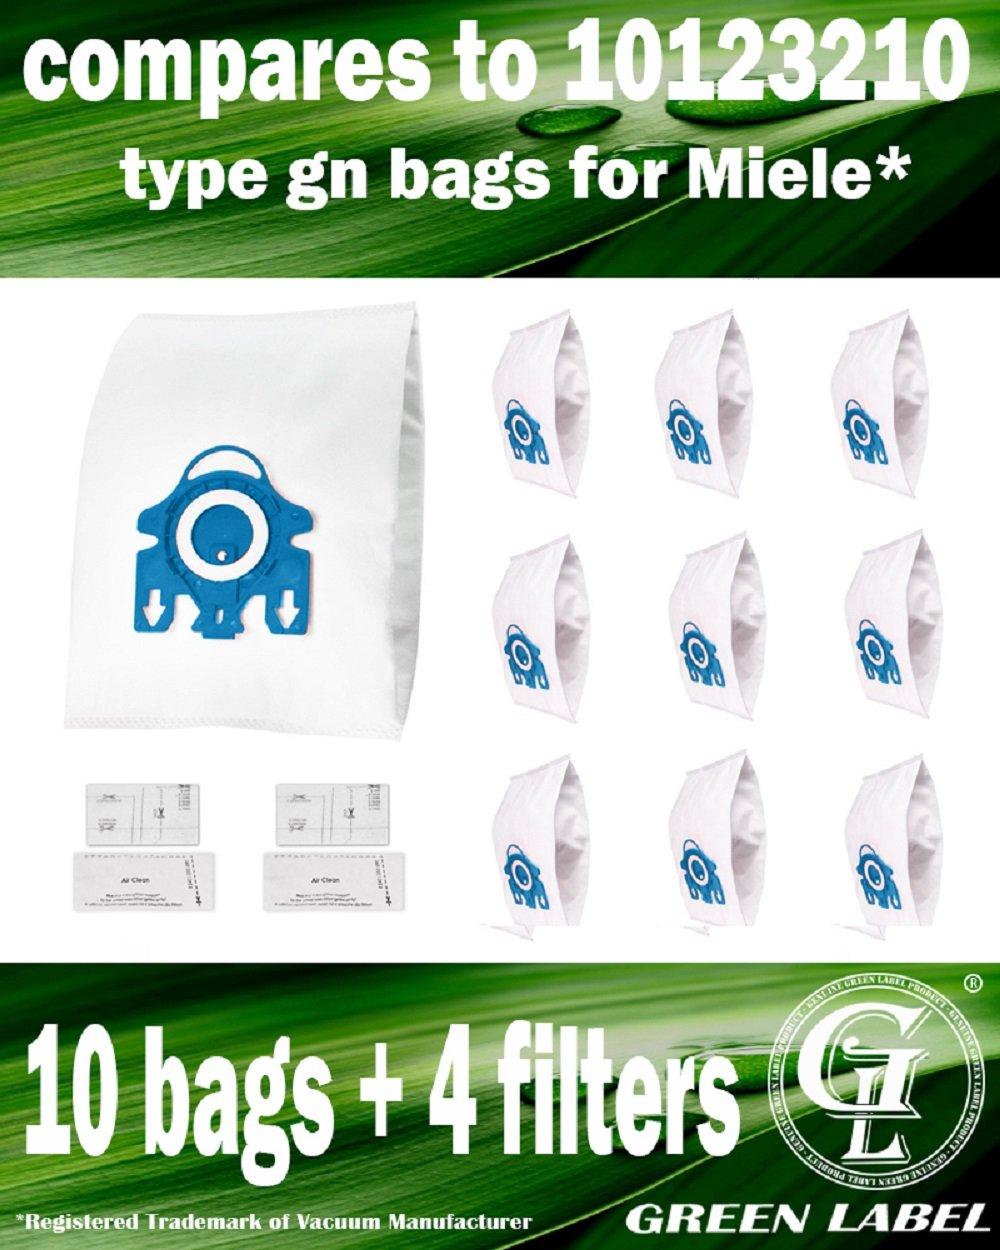 Reemplaza a 10123210 10+4 Empaque de 10 Bolsas 3D de tipo AirClean GN y 4 Microfiltros para aspiradora Miele Producto genuino de Green Label